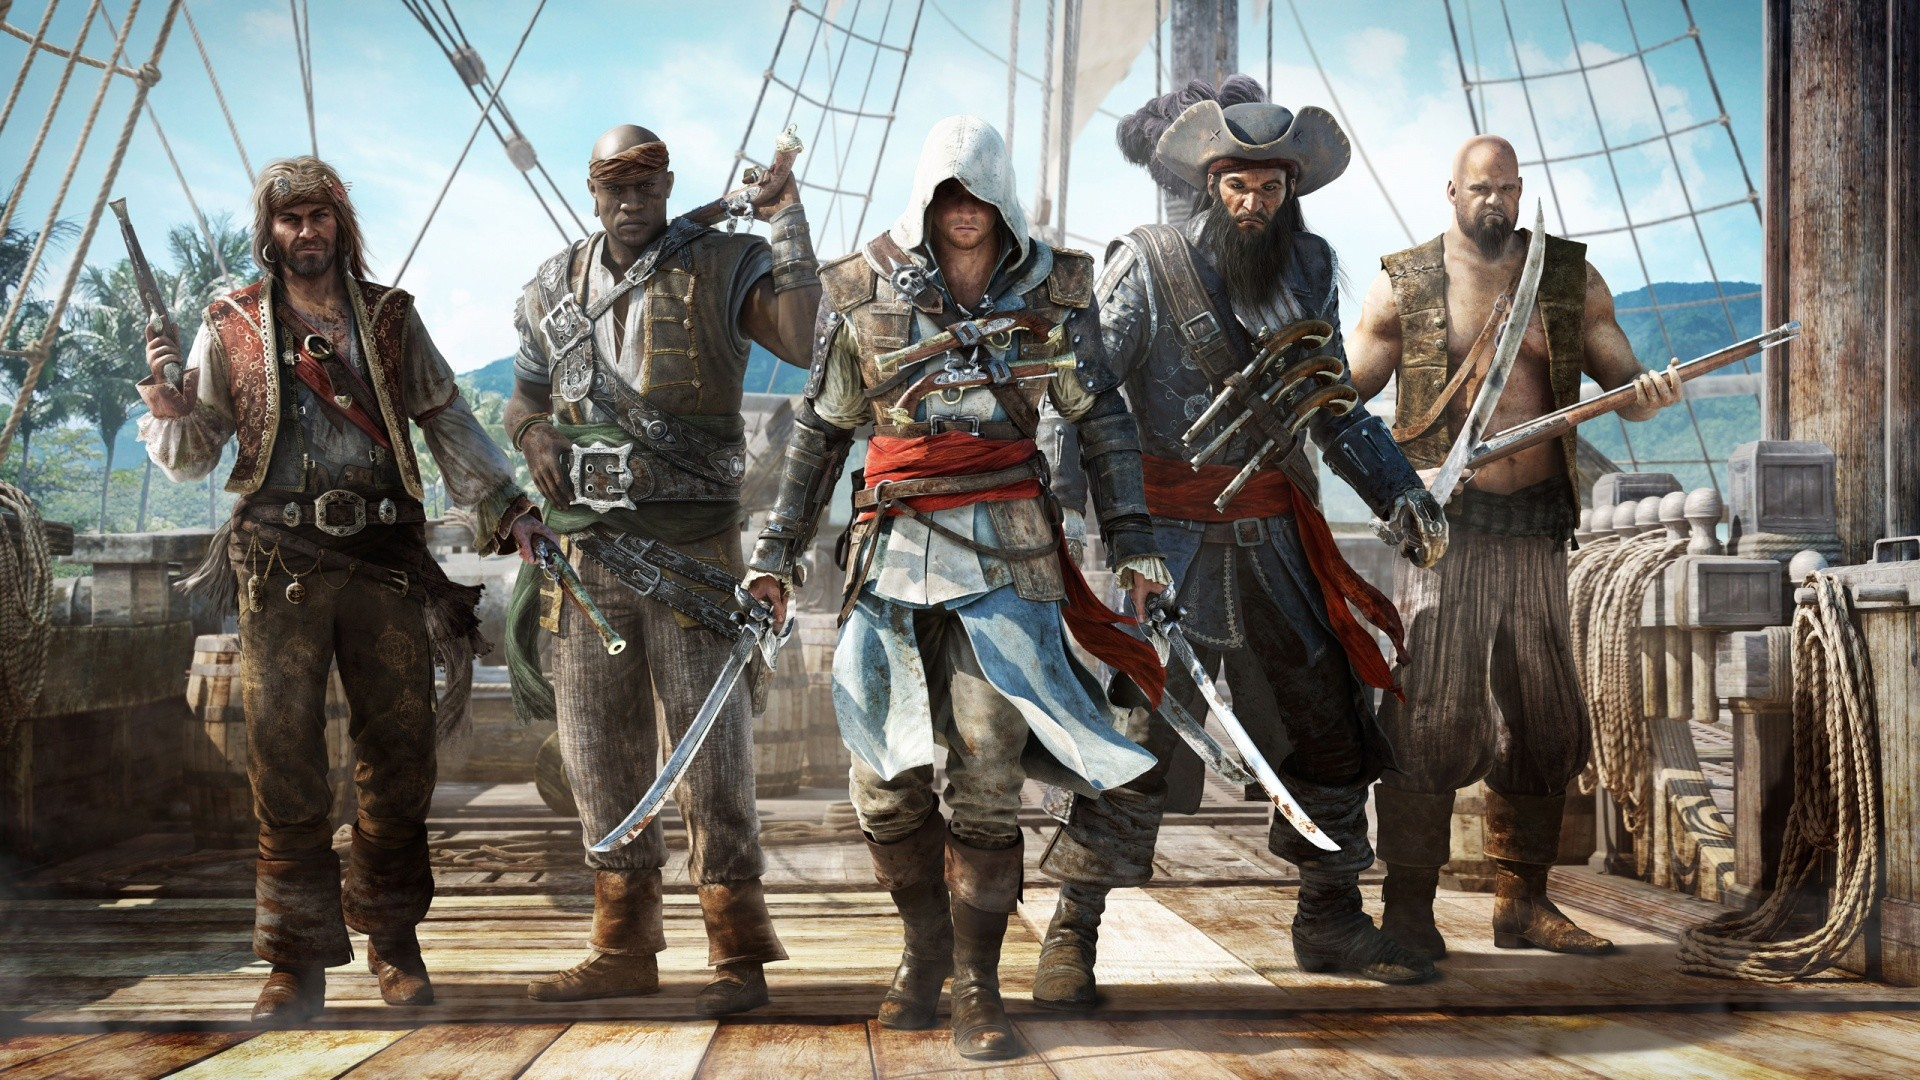 Assassin's Creed Black Flag Costume